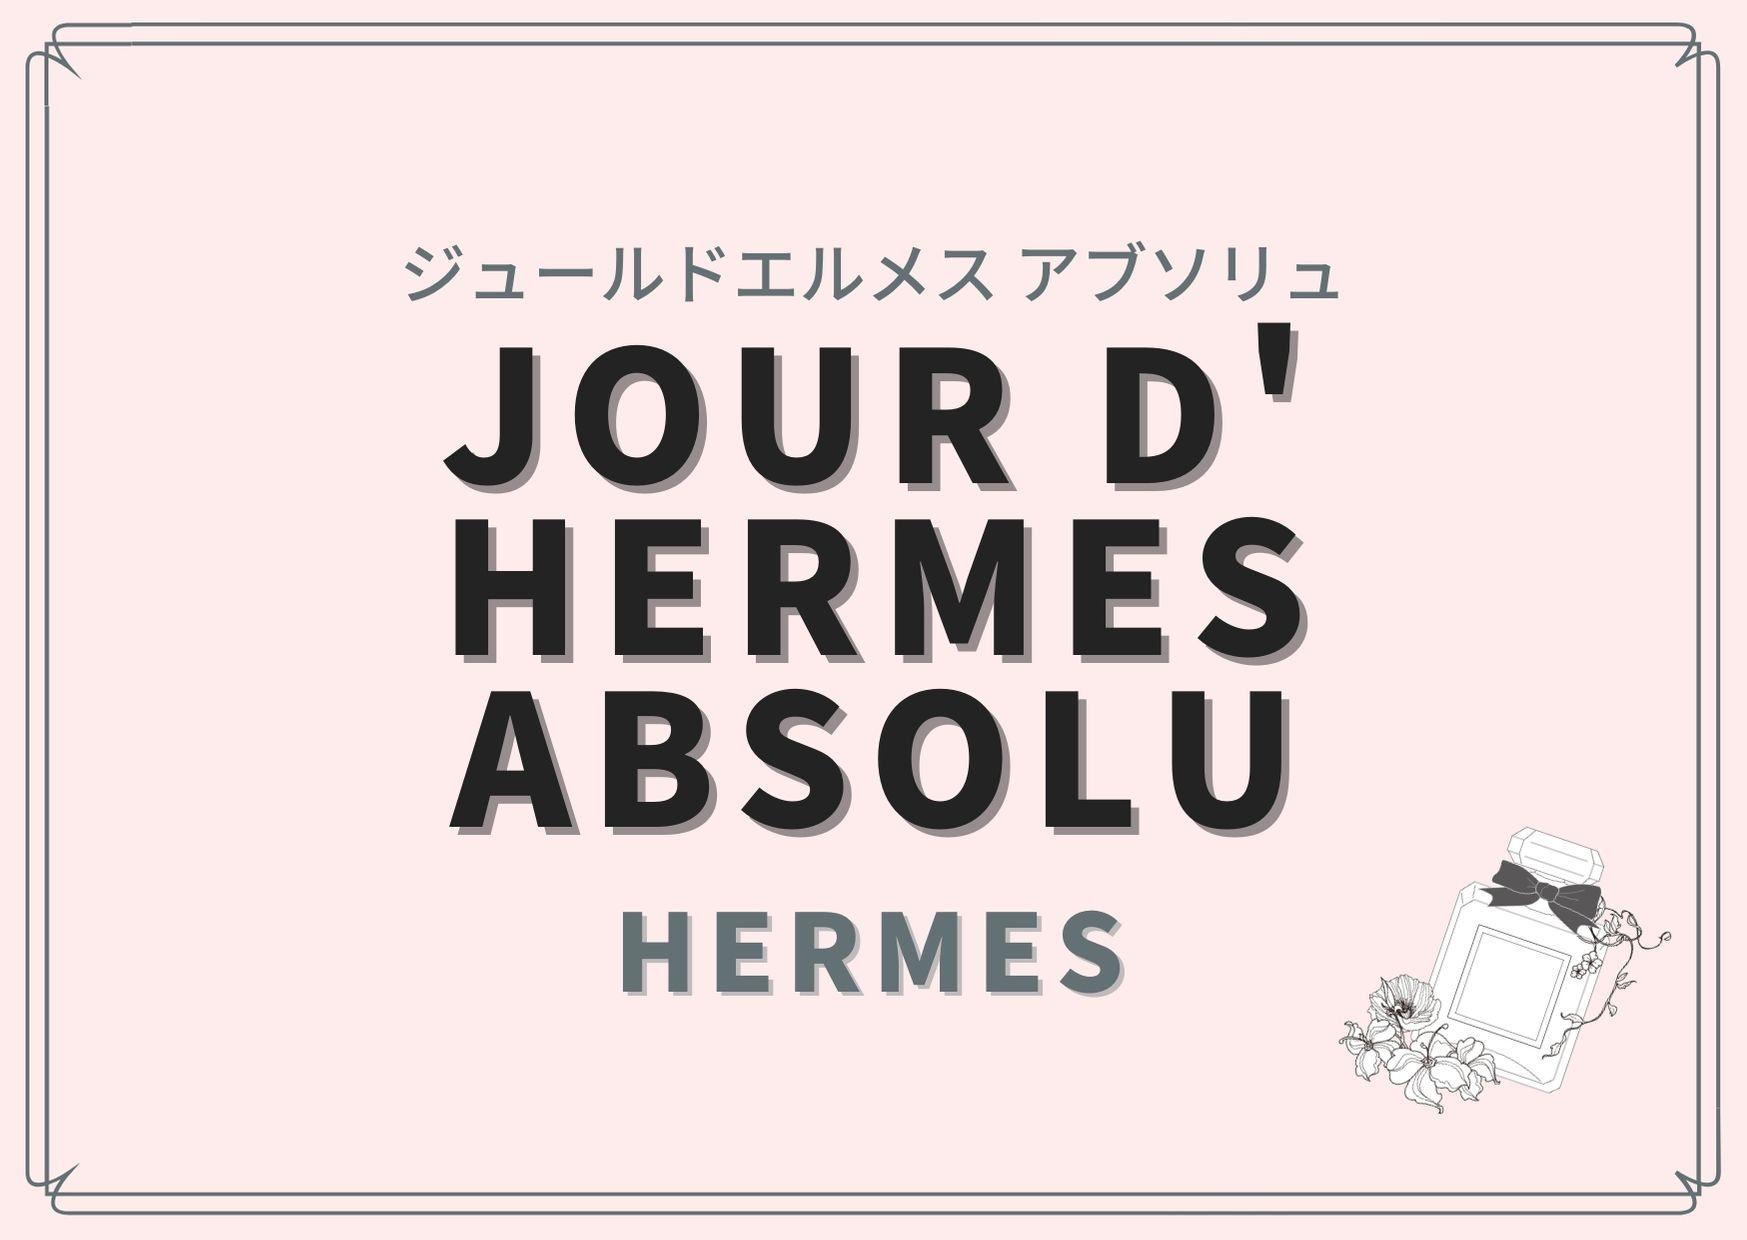 JOUR D' HERMES ABSOLU(ジュールドエルメス・アブソリュ)/HERMES(エルメス)